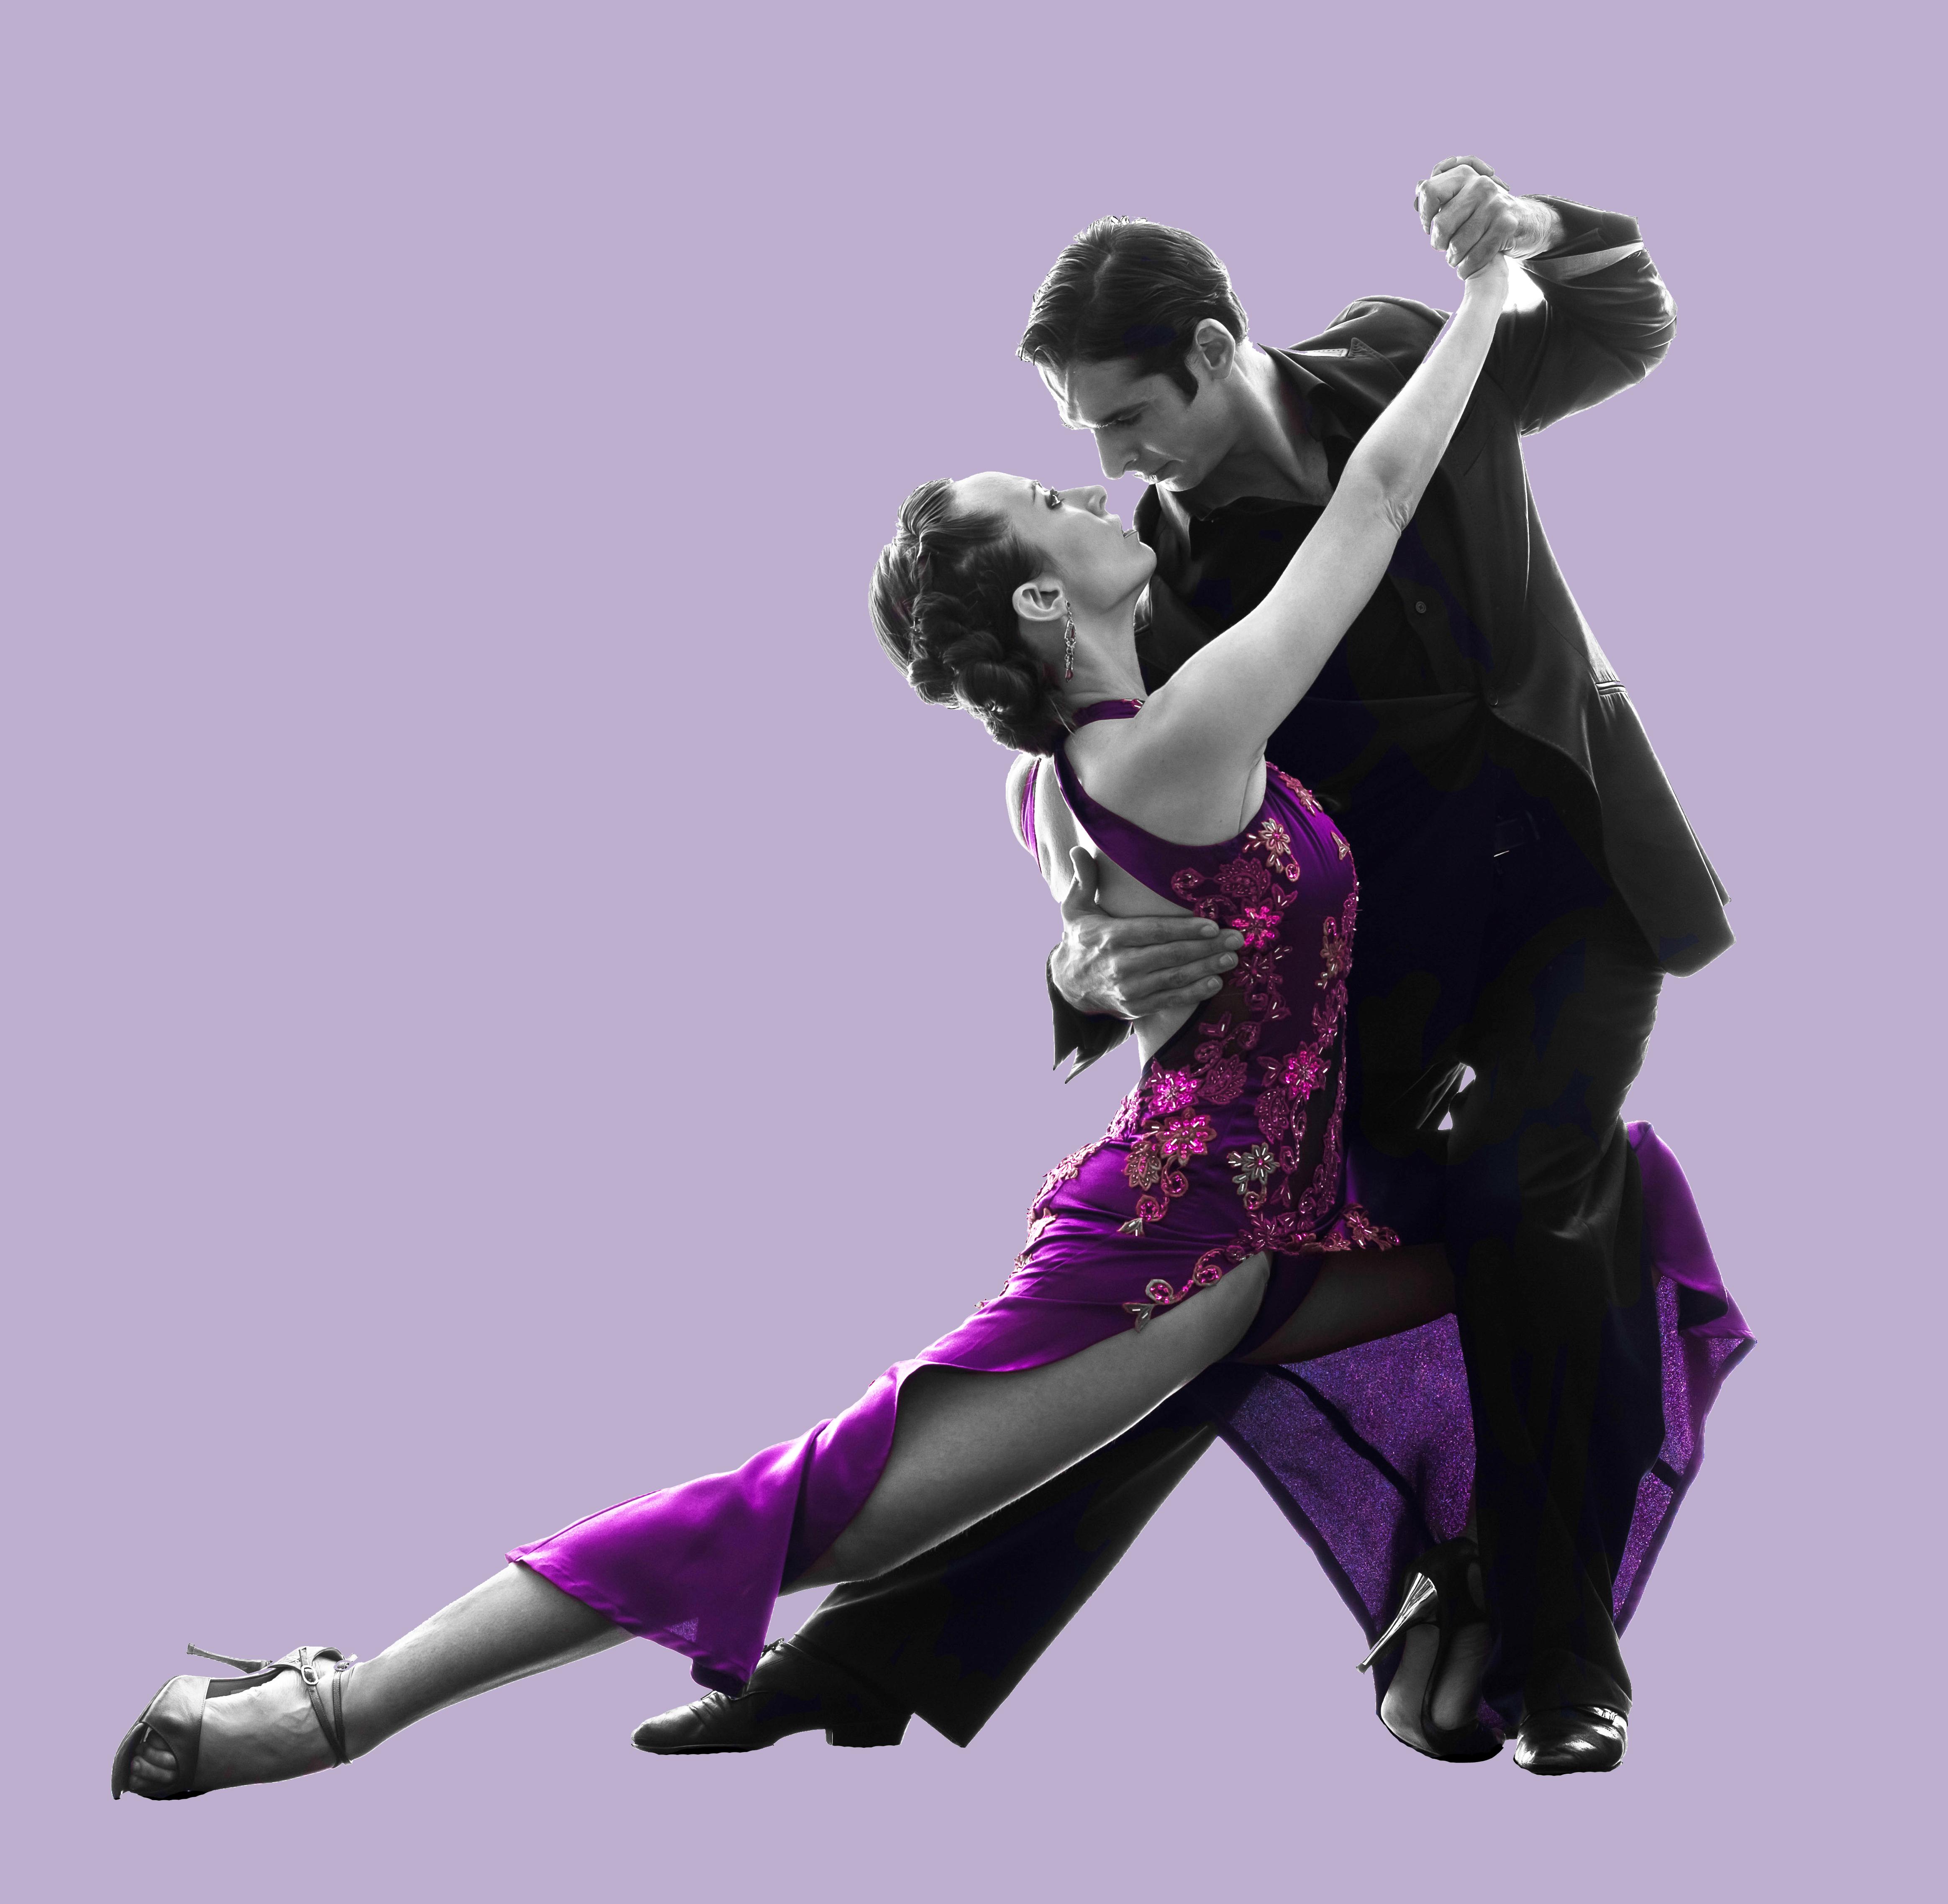 Utah Symphony, Dancing & Romancing - February 8